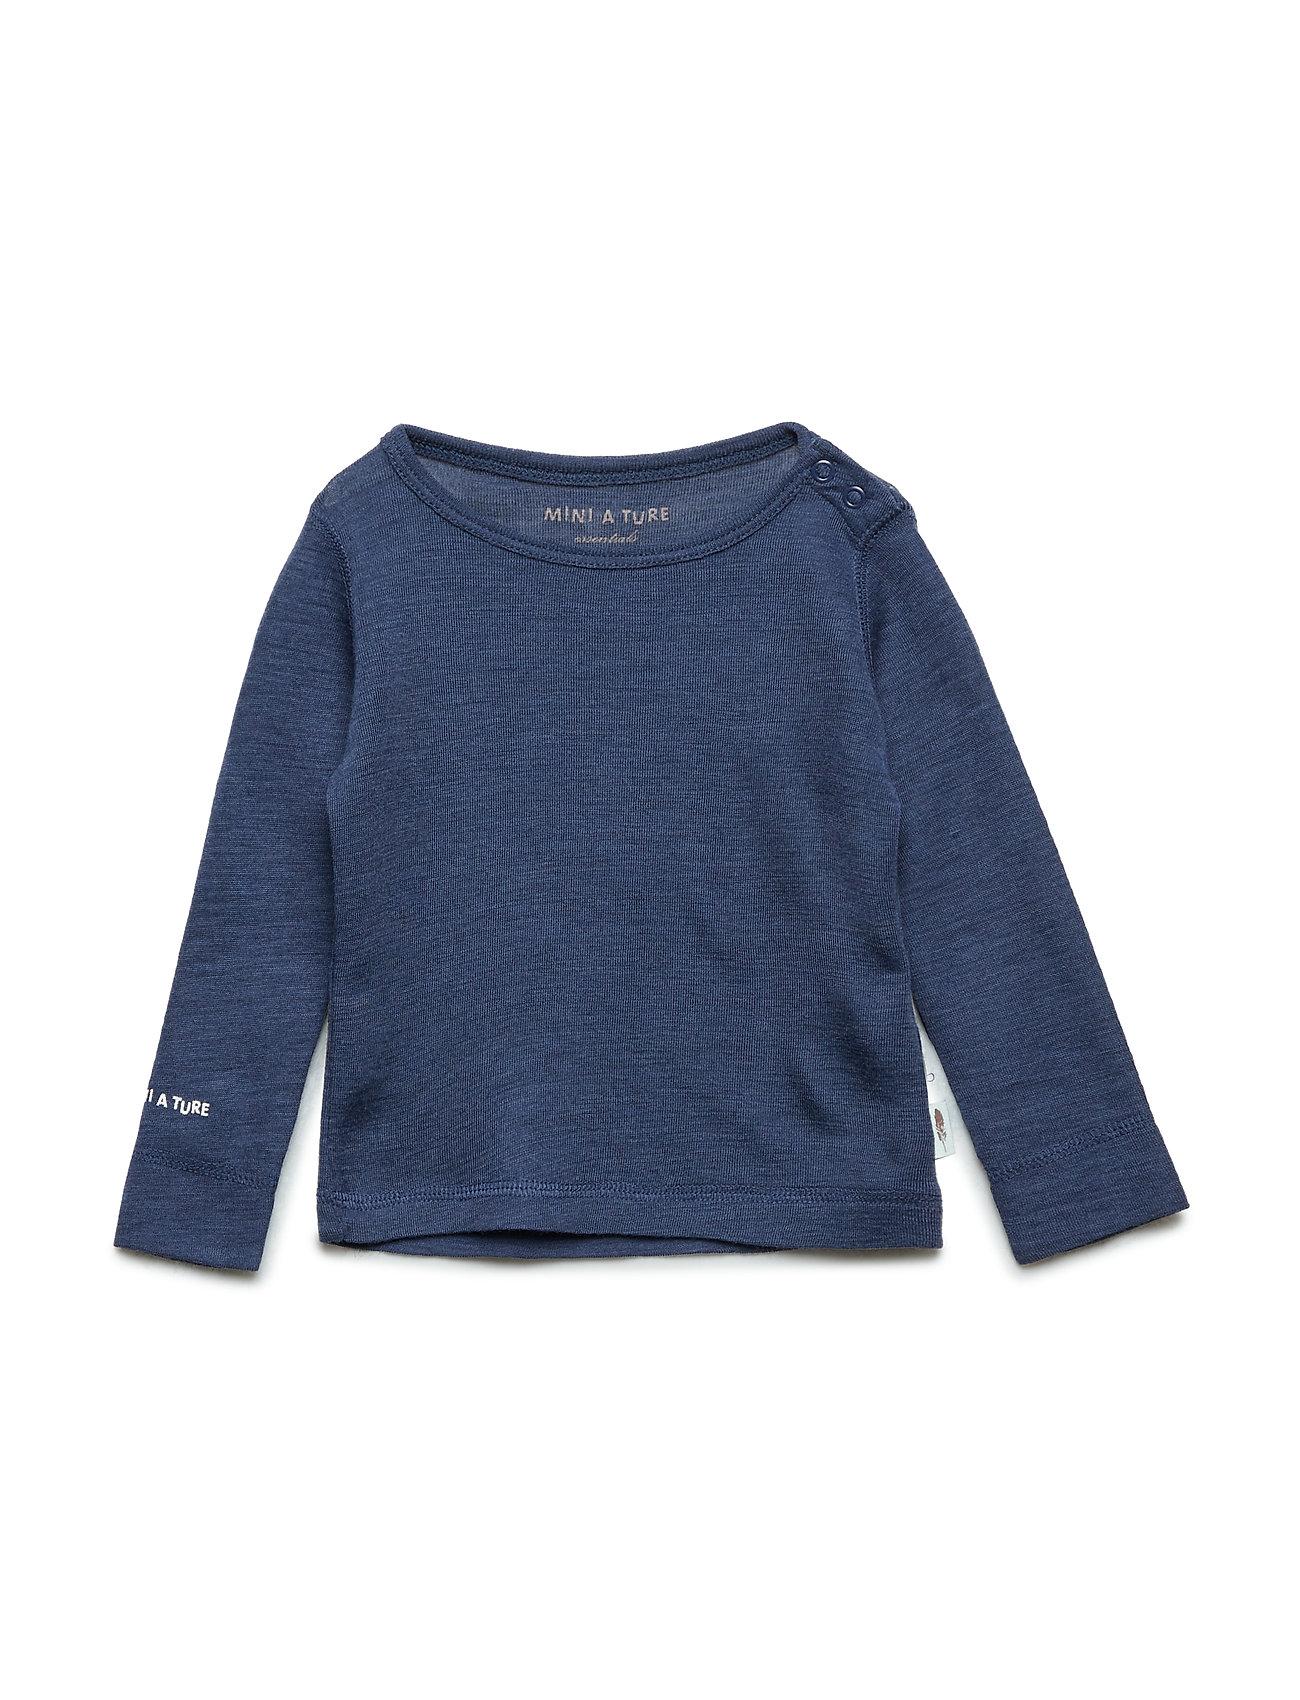 Mini A Ture Erion T-shirt, MK - MOOD INDIGO